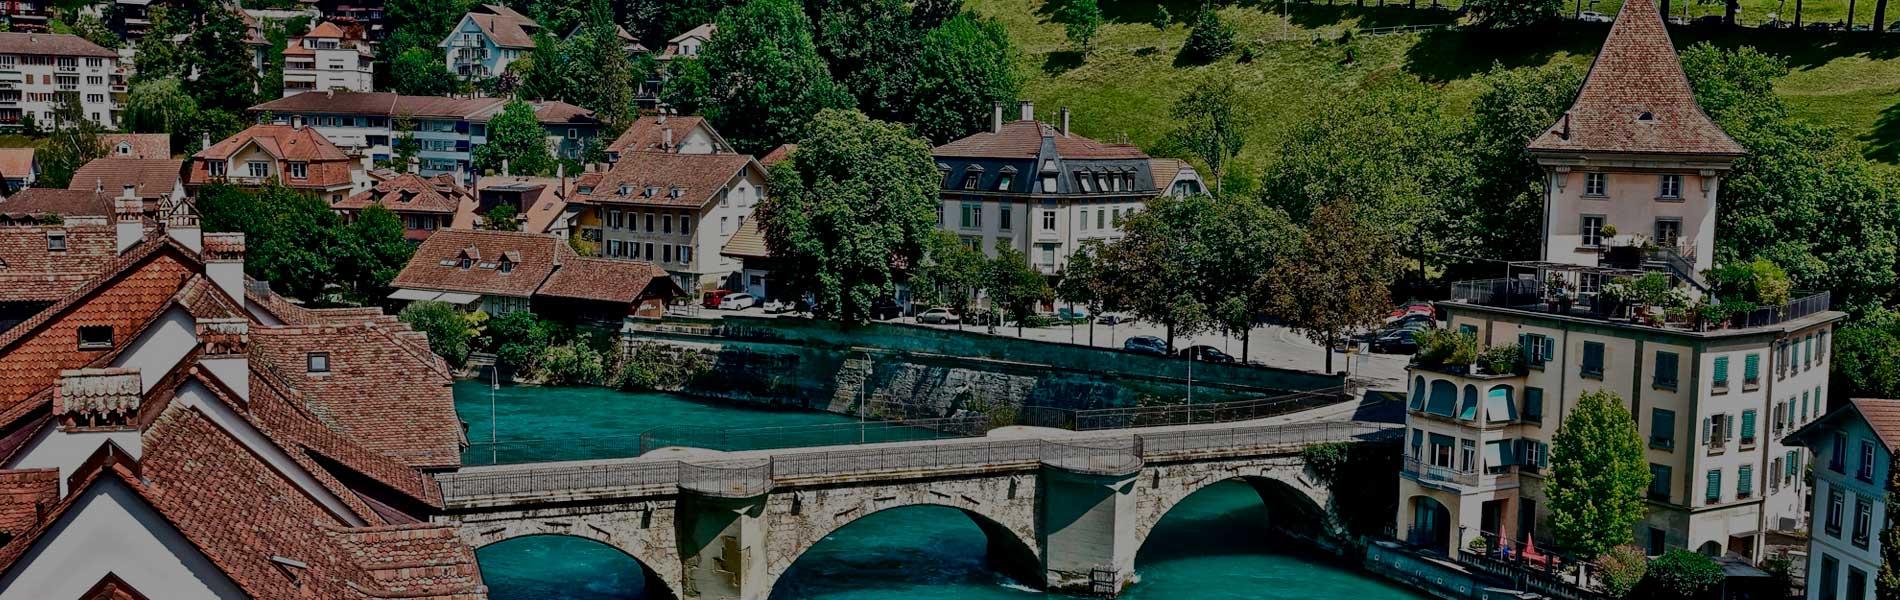 Curso de francés en Suiza